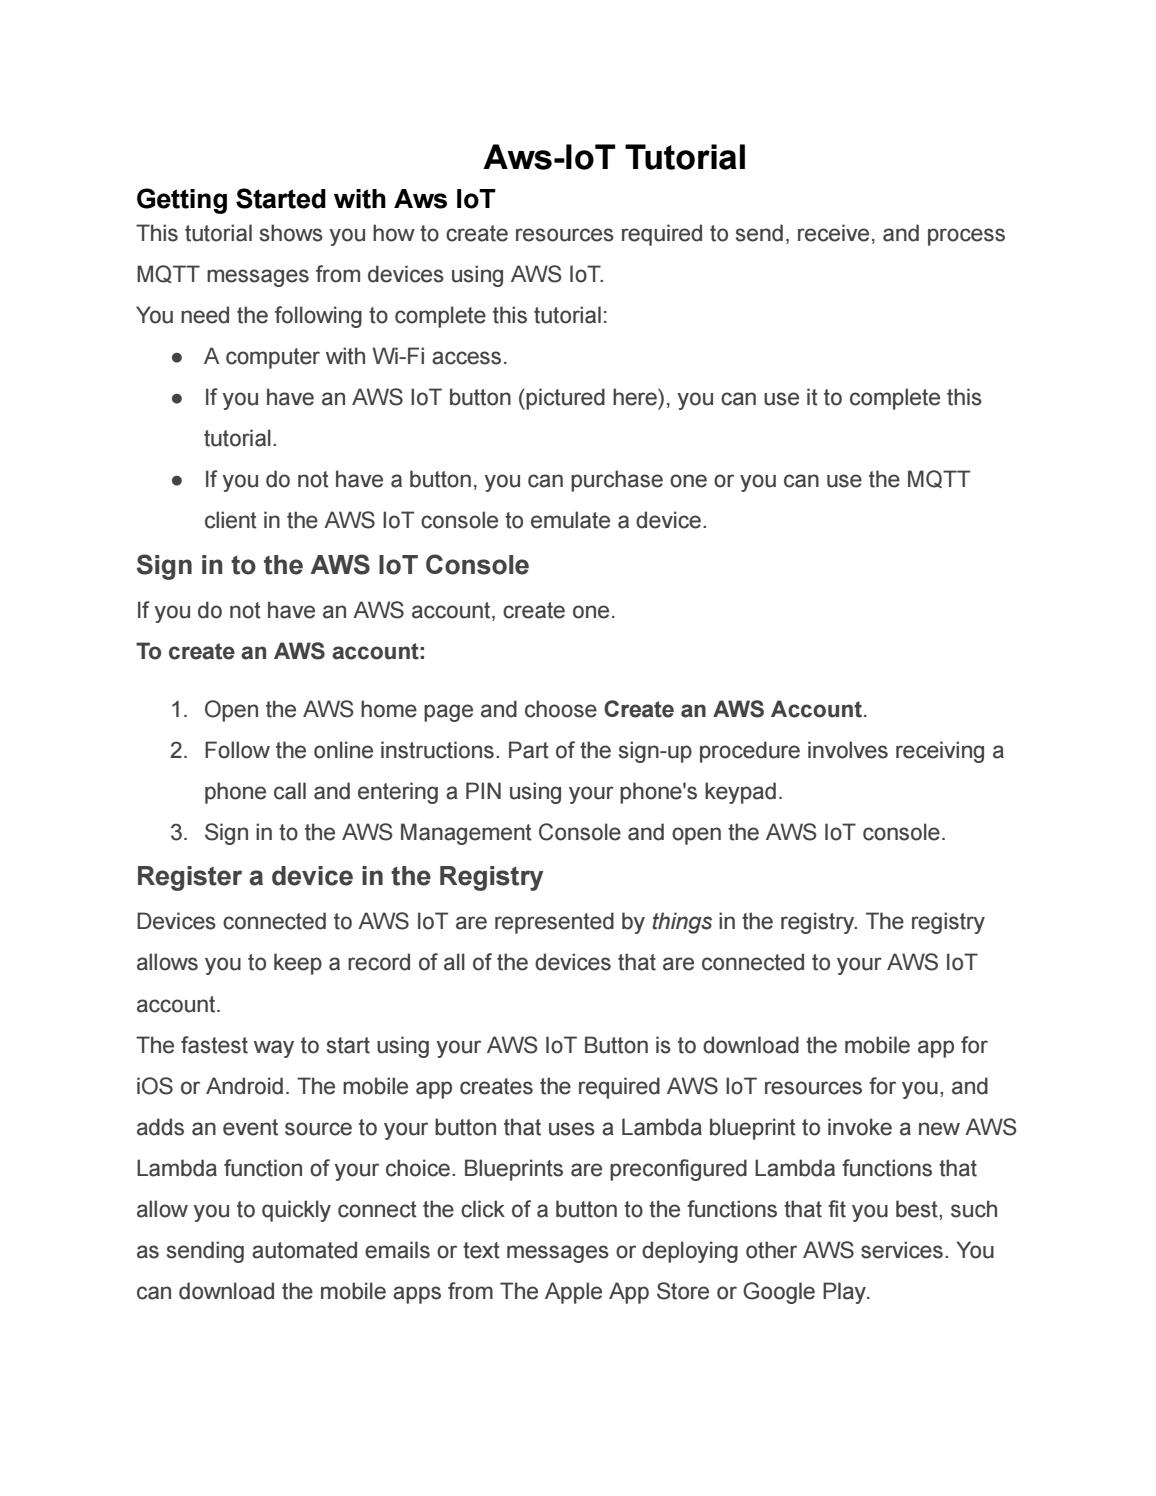 Aws iot tutorial google docs by lakshmisujatha2803 - issuu